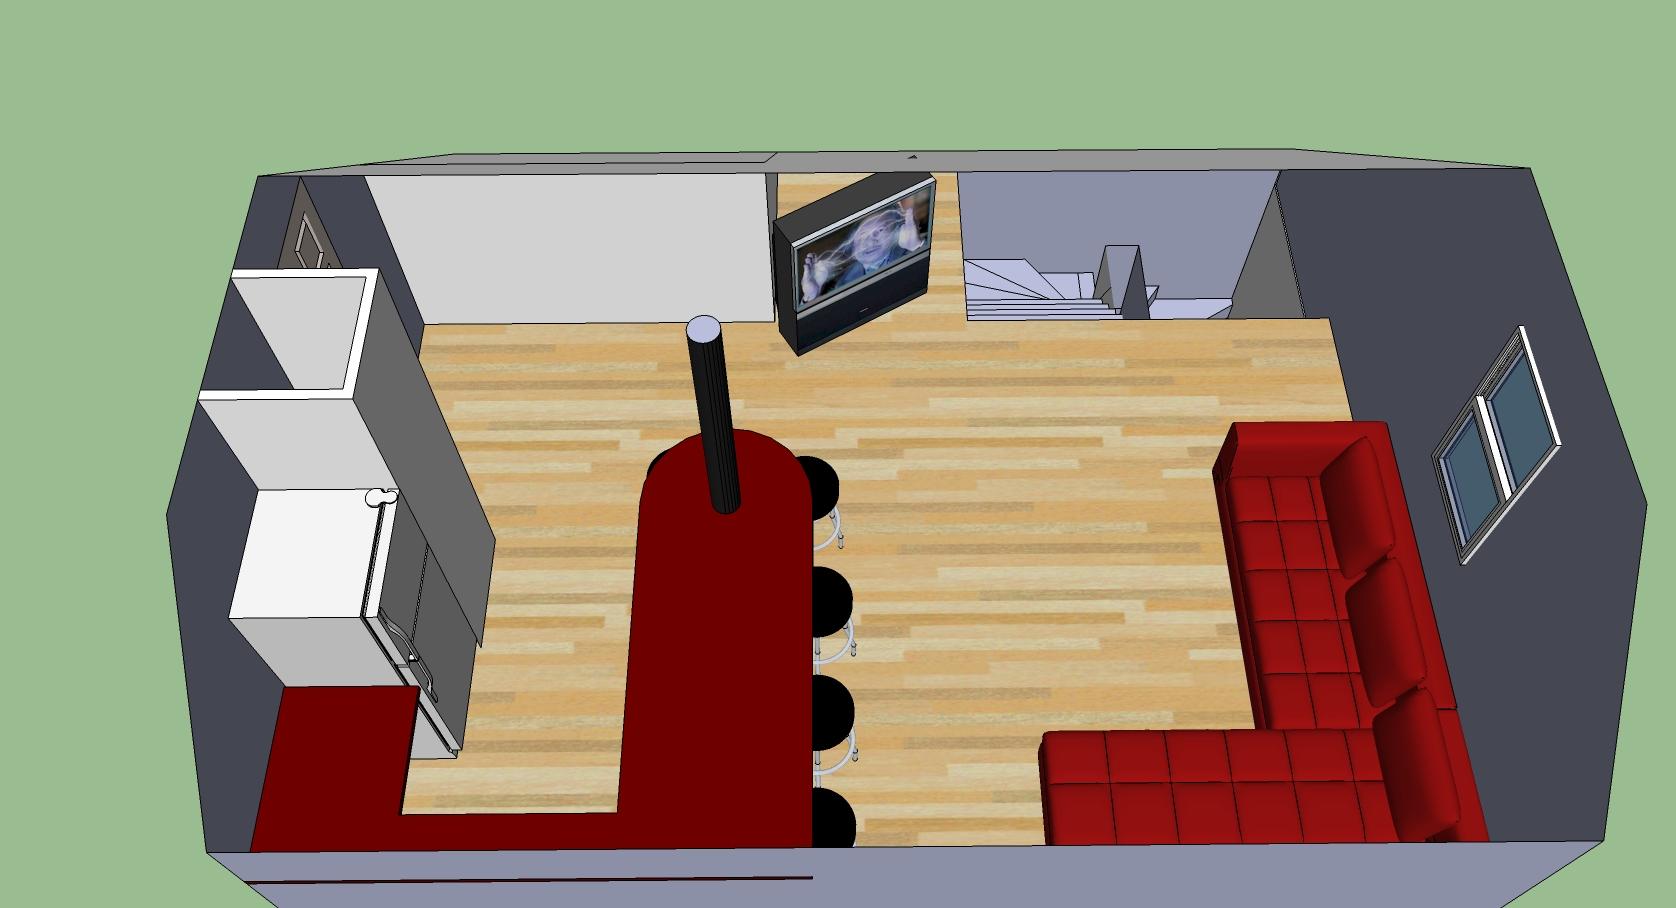 Control room build: modes, soffits, slat walls, etc. - Page 11 ...